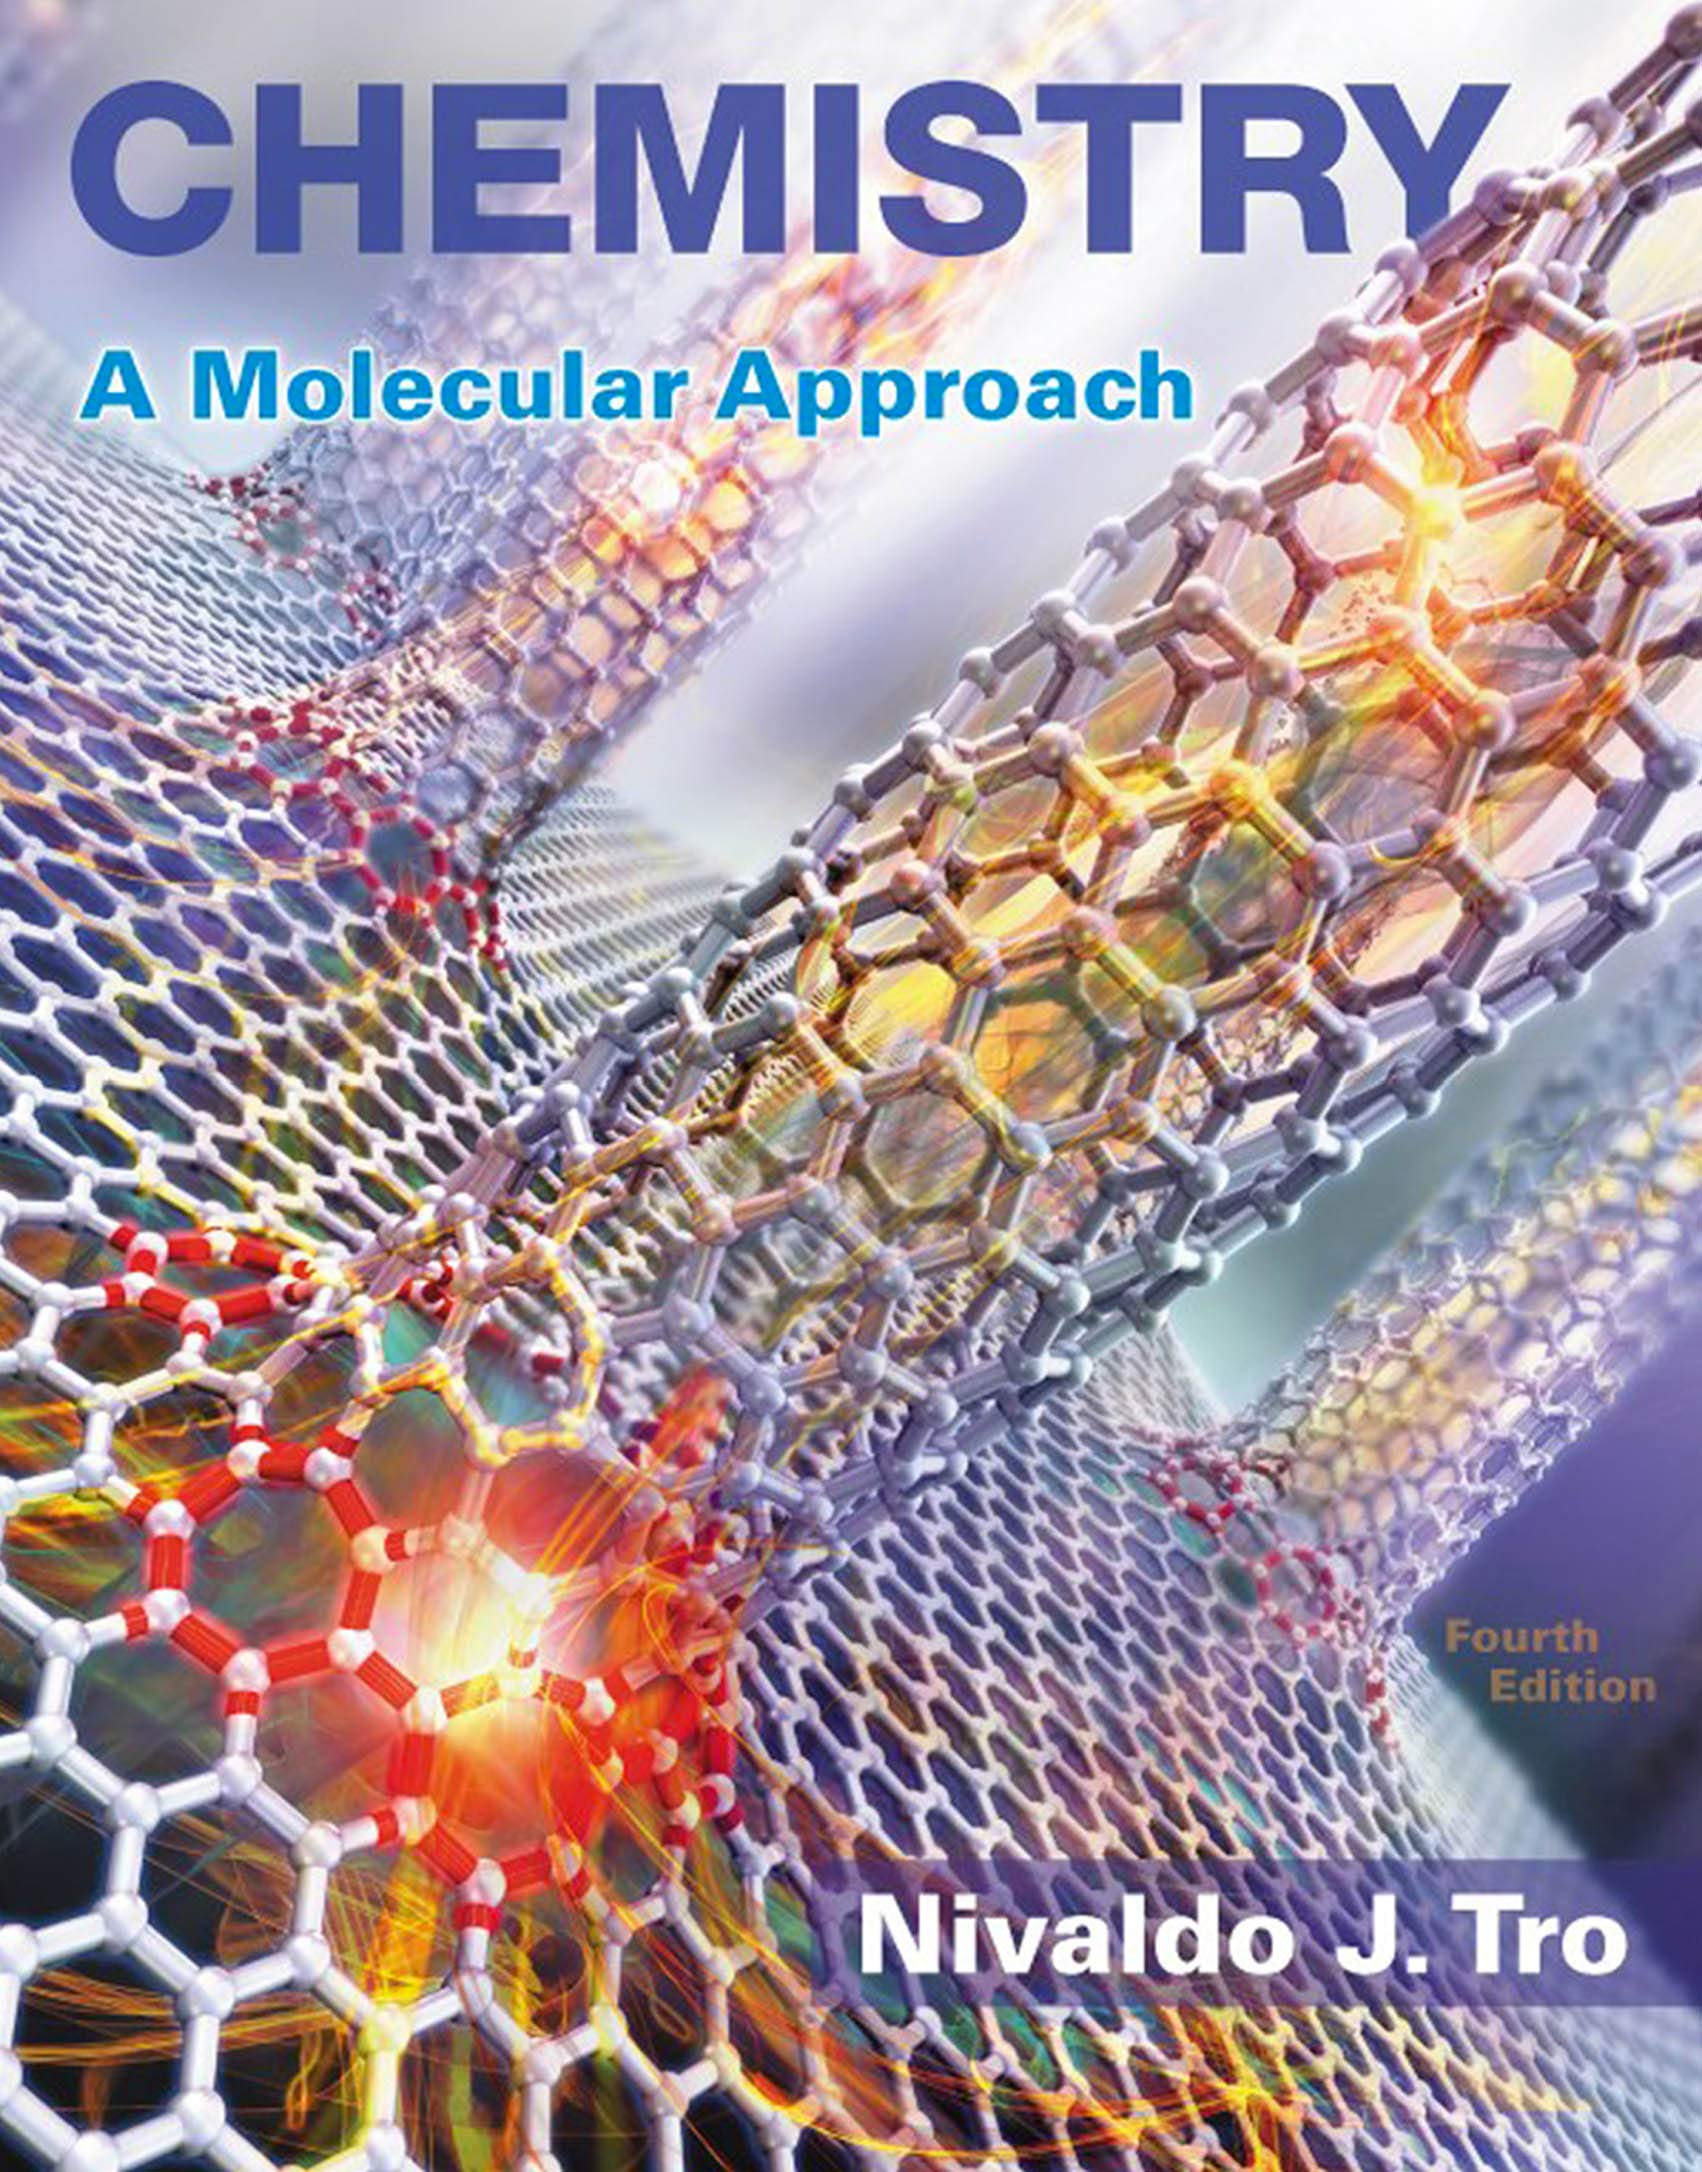 Chemistry A Molecular Approach 2 Downloads 4 J Tro Nivaldo Amazon Com